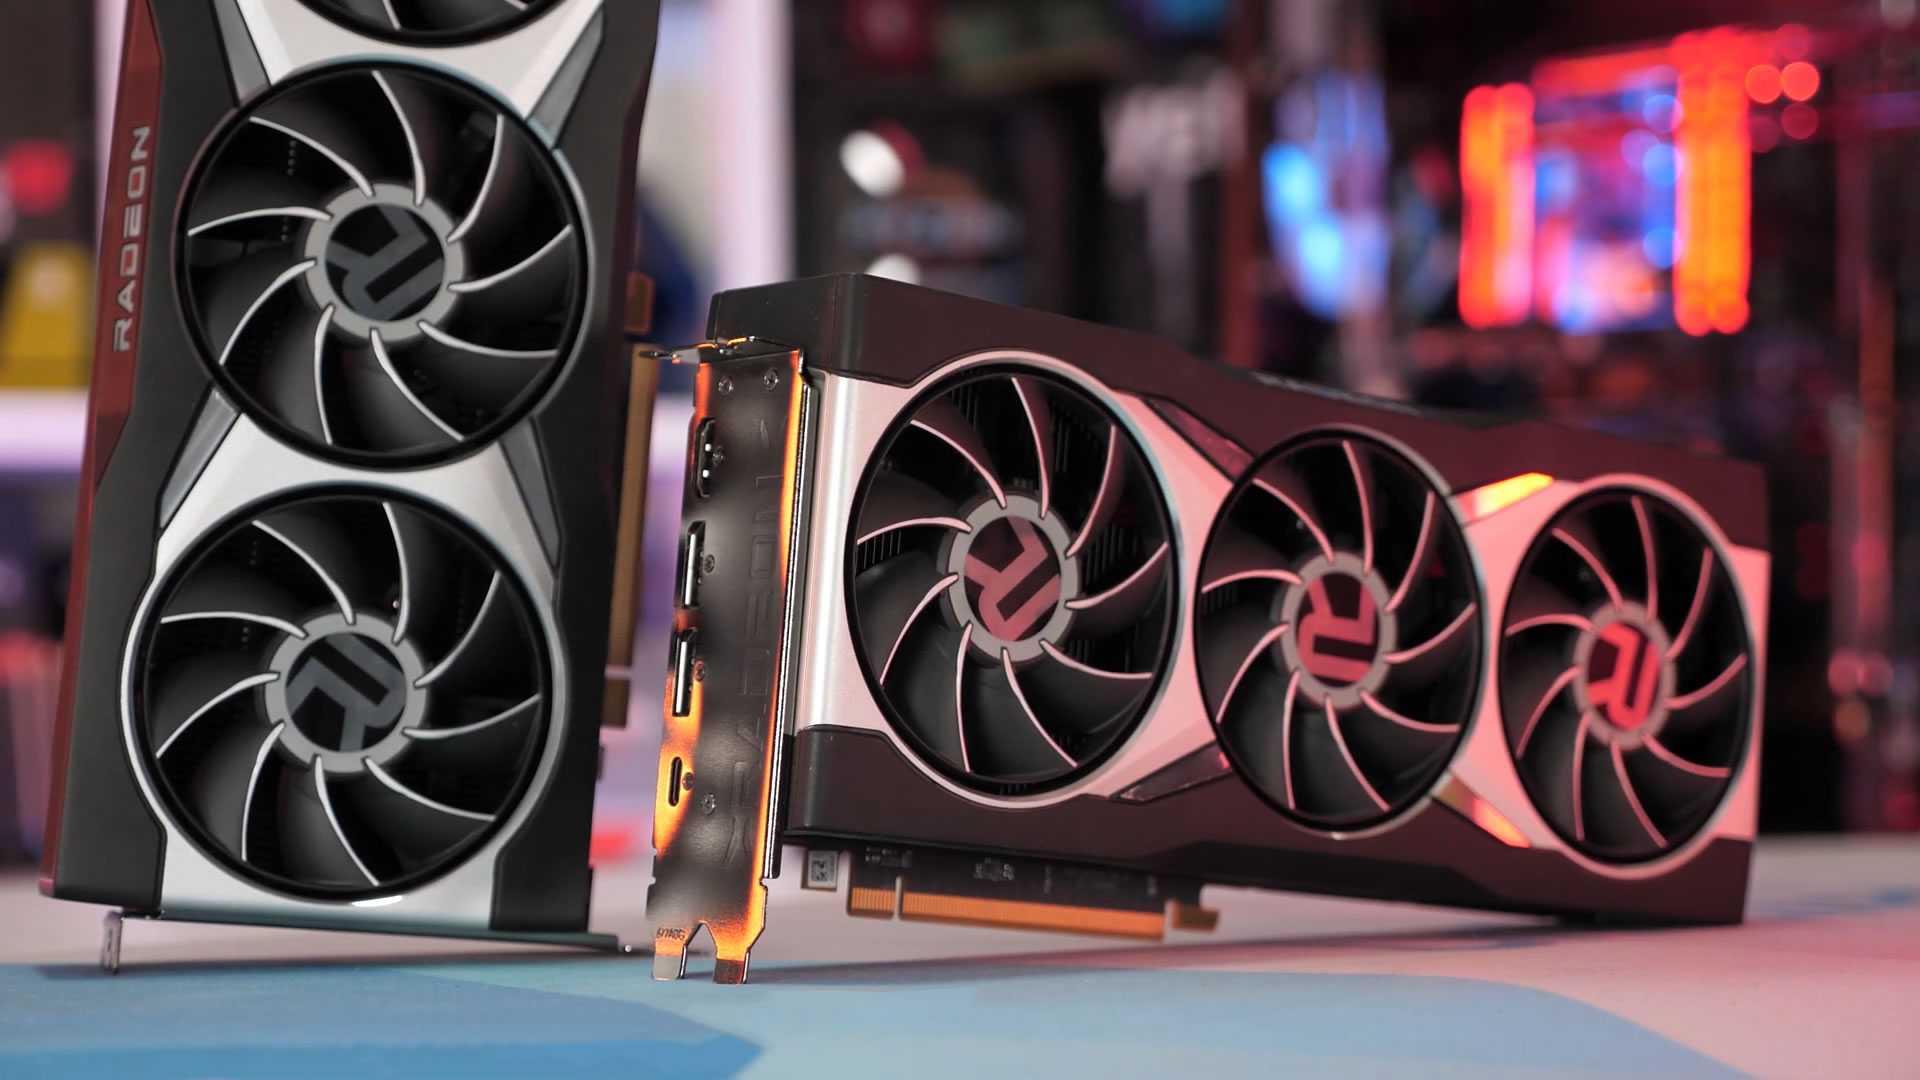 PowerColor lists AMD